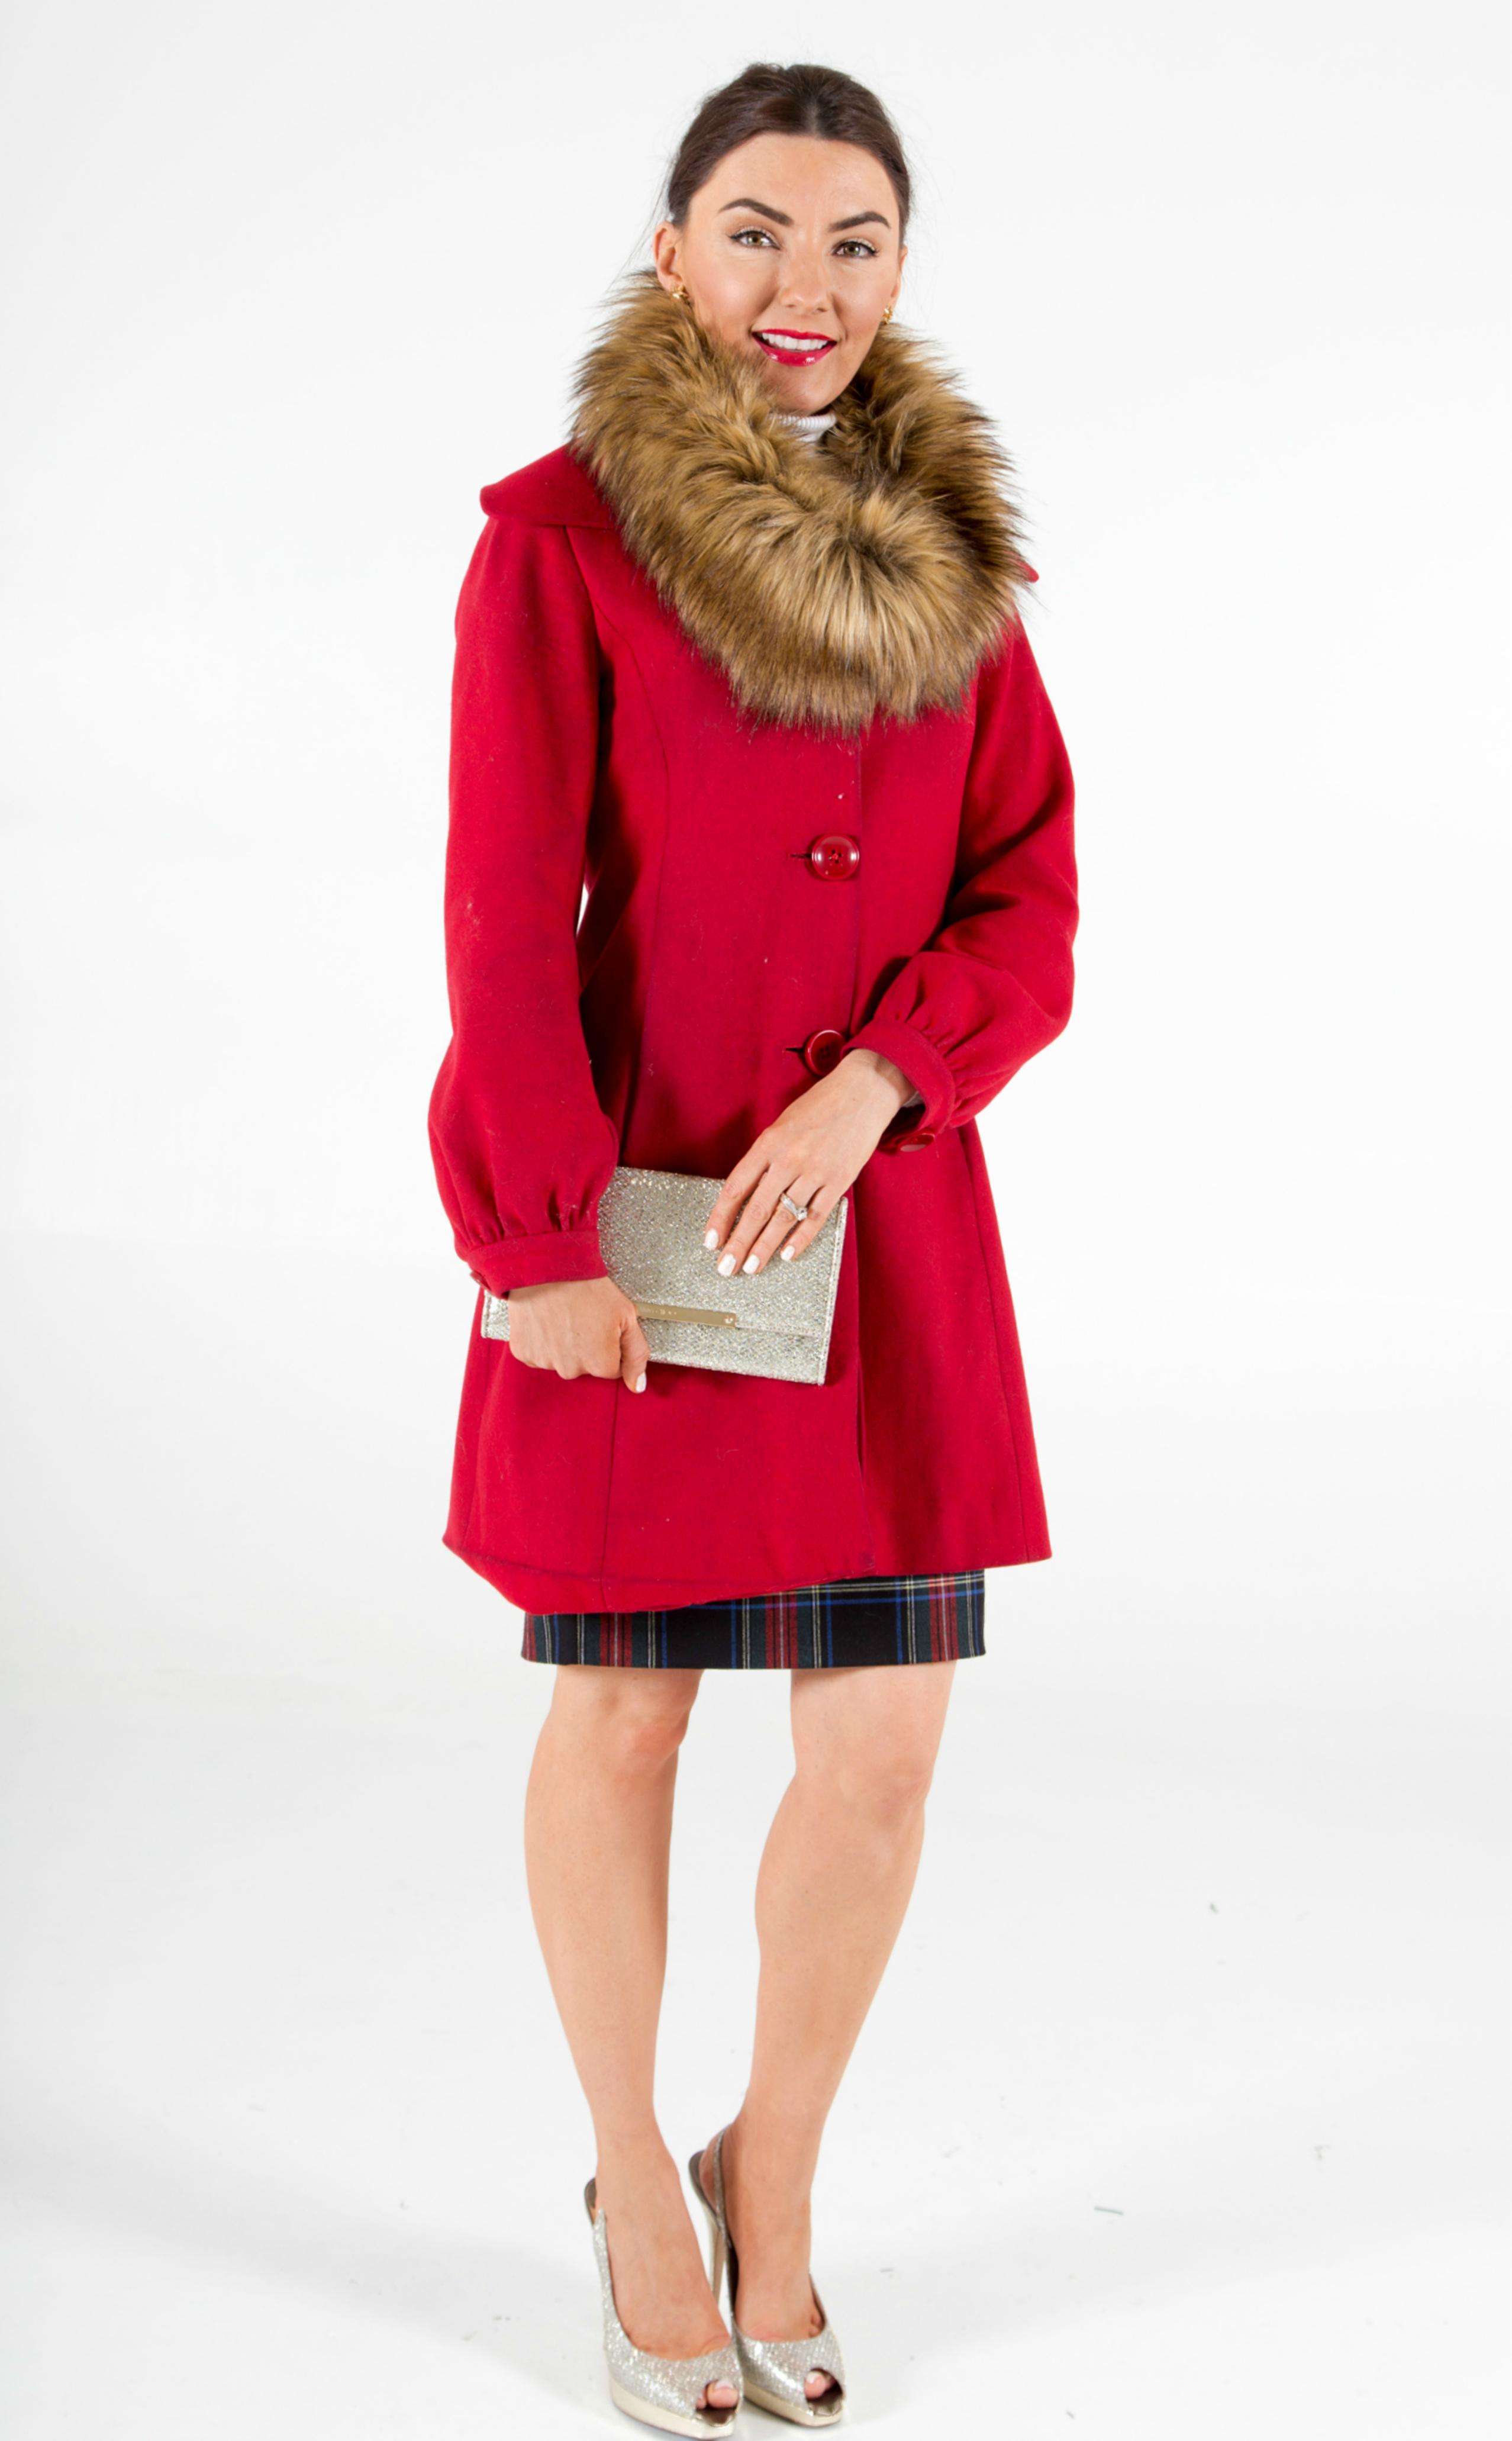 fur trim red holiday coat and Jimmy Choo glitter heels